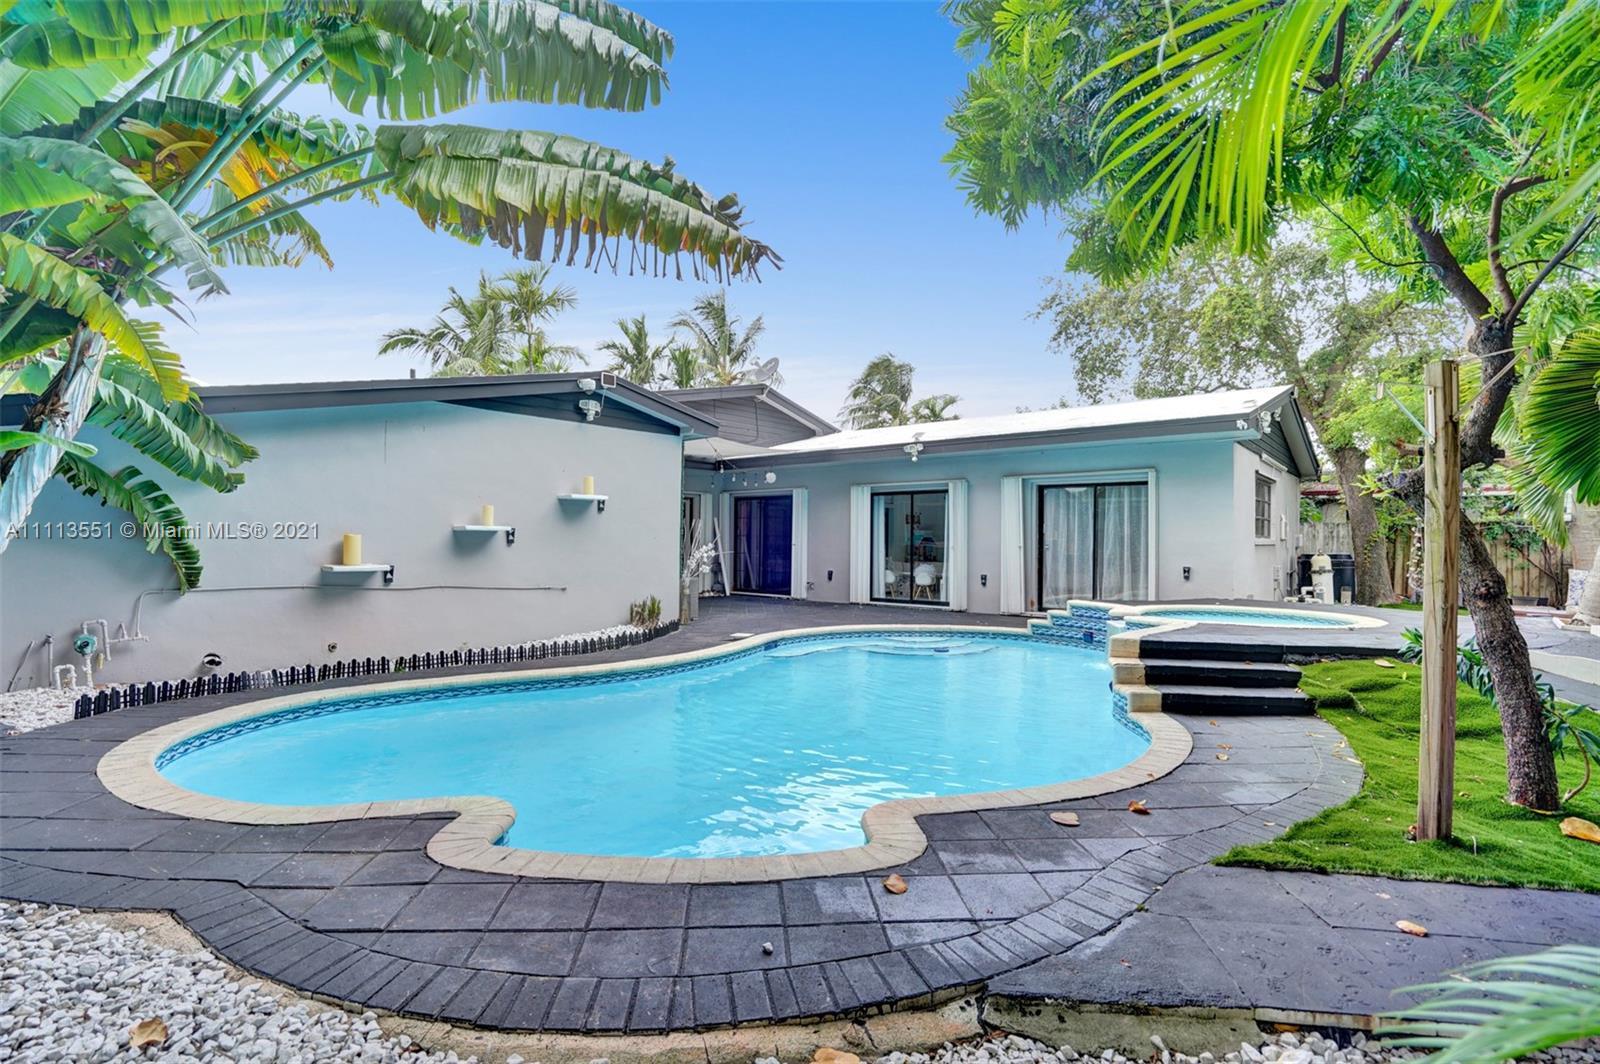 Single Family Home,For Sale,550 NE 180th Dr, North Miami Beach, Florida 33162,Brickell,realty,broker,condos near me